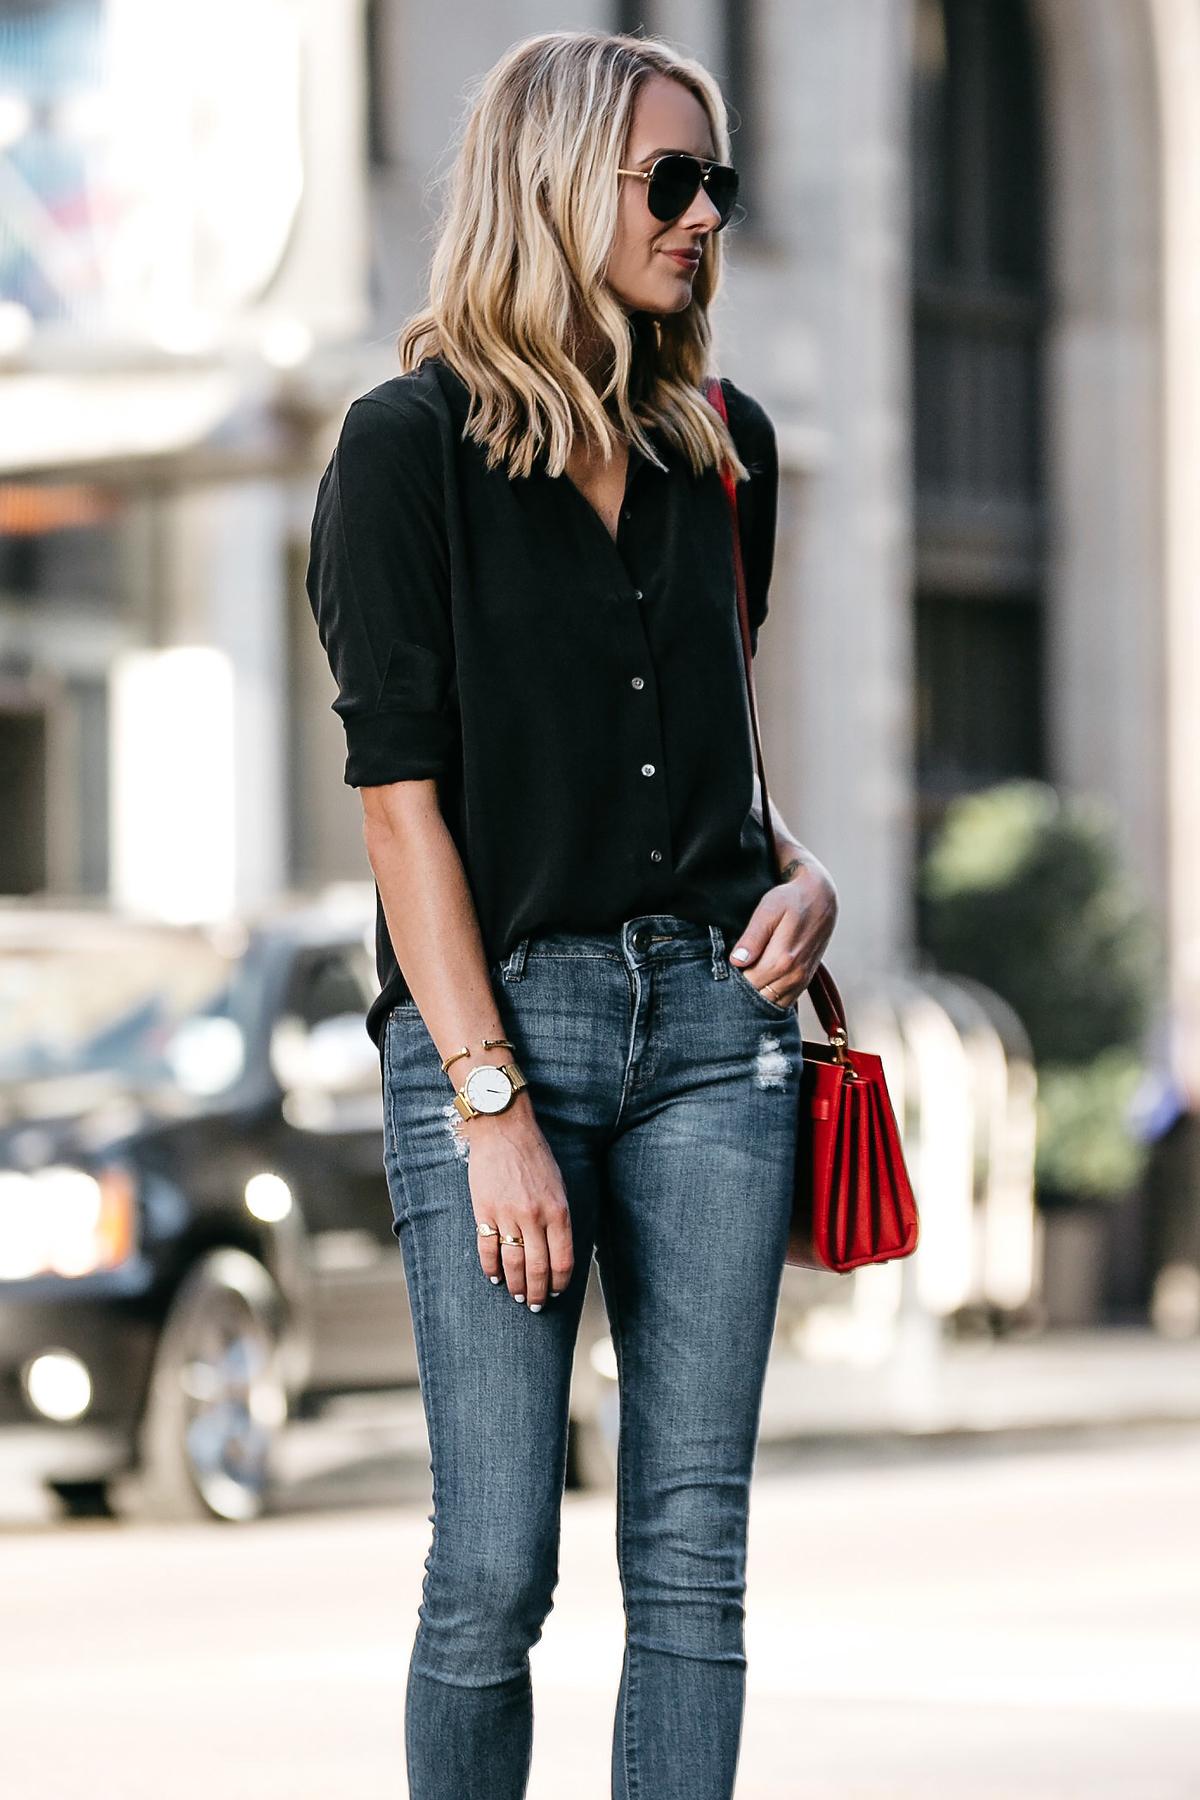 Blonde Wearing Everlane Black Button Up Shirt Denim Skinny Jeans Fashion Jackson Dallas Blogger Fashion Blogger Street Style